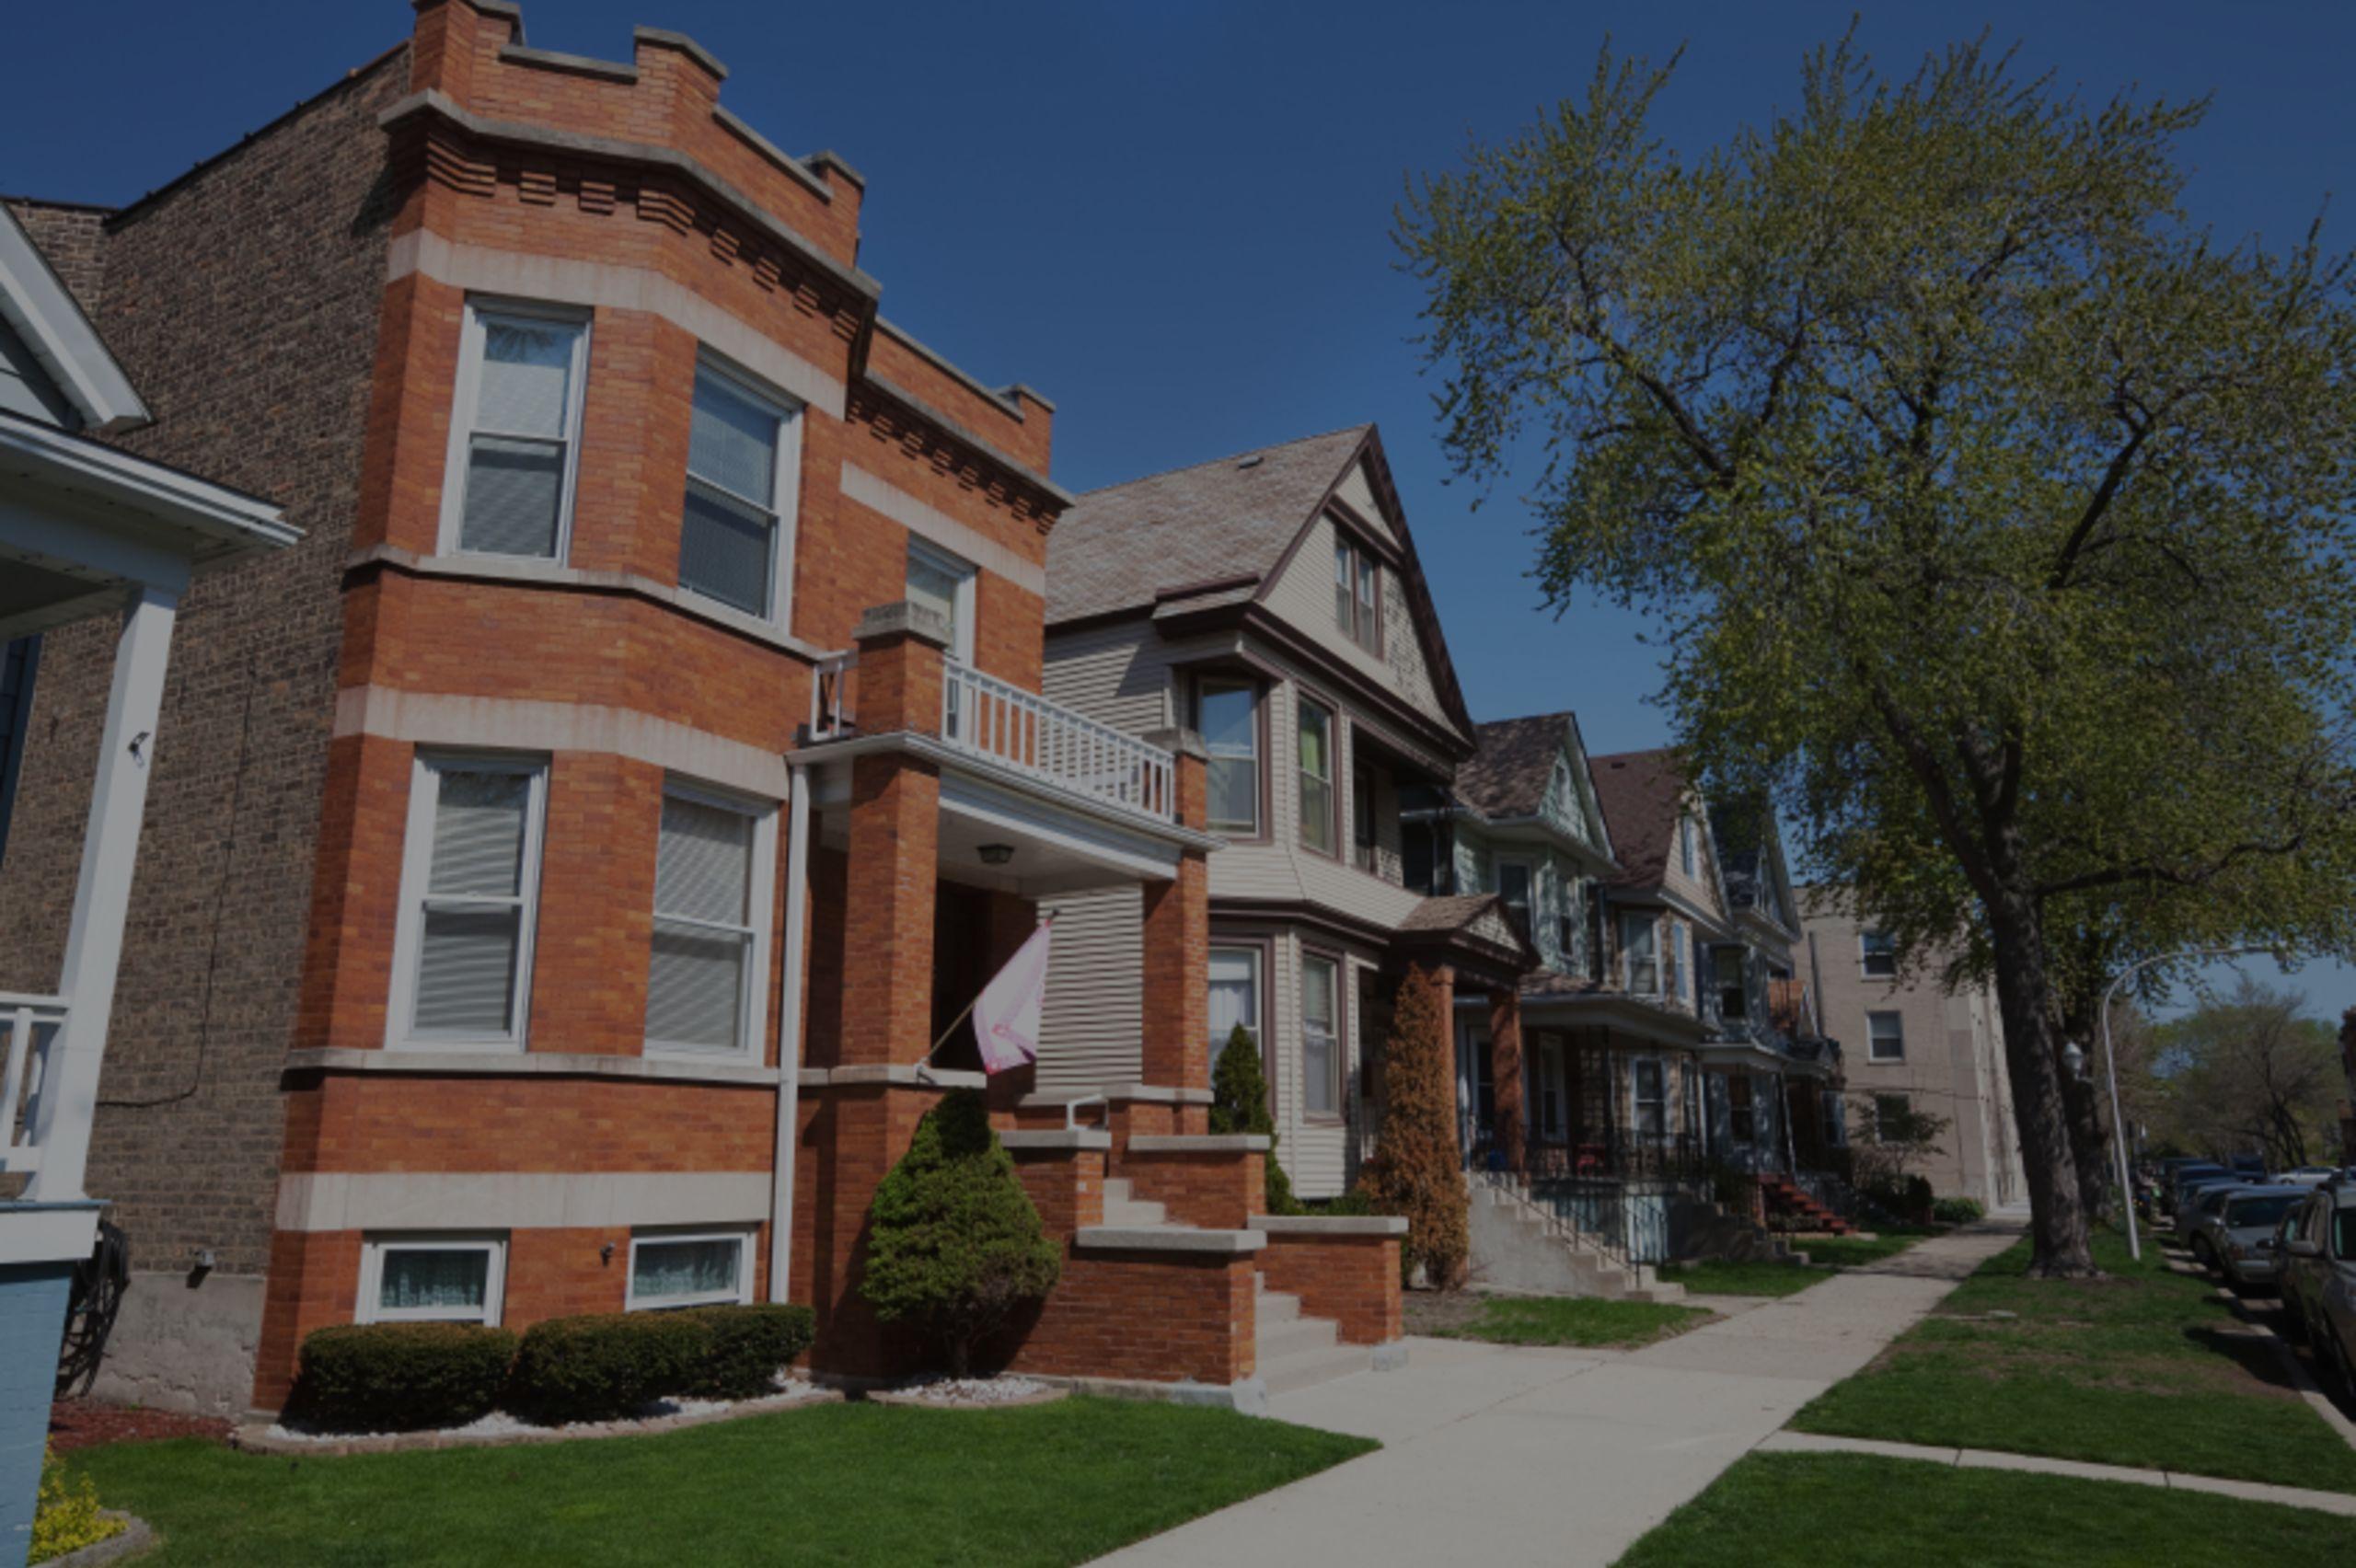 Chicago Neighborhood Tour: North Center